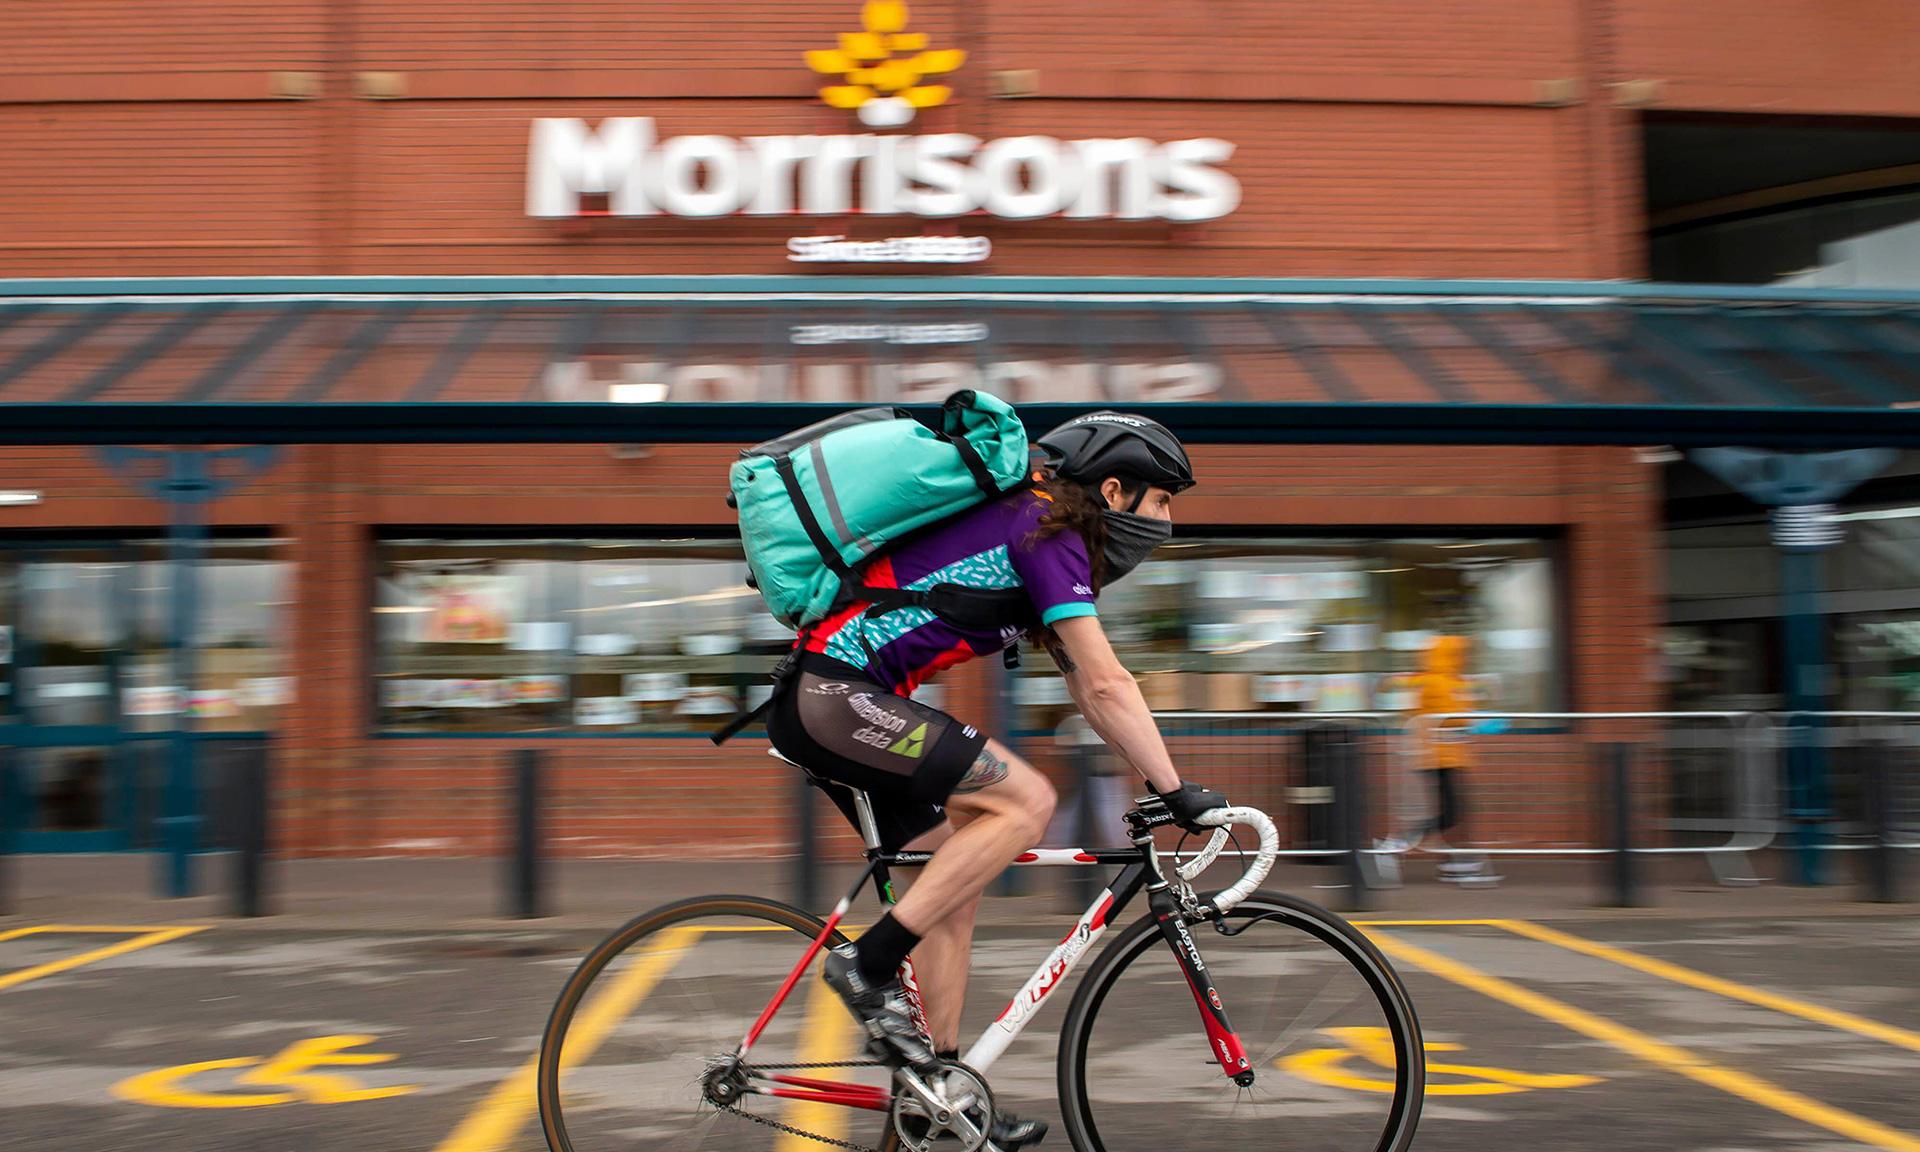 Deliveroo cyclist outside Morrisons